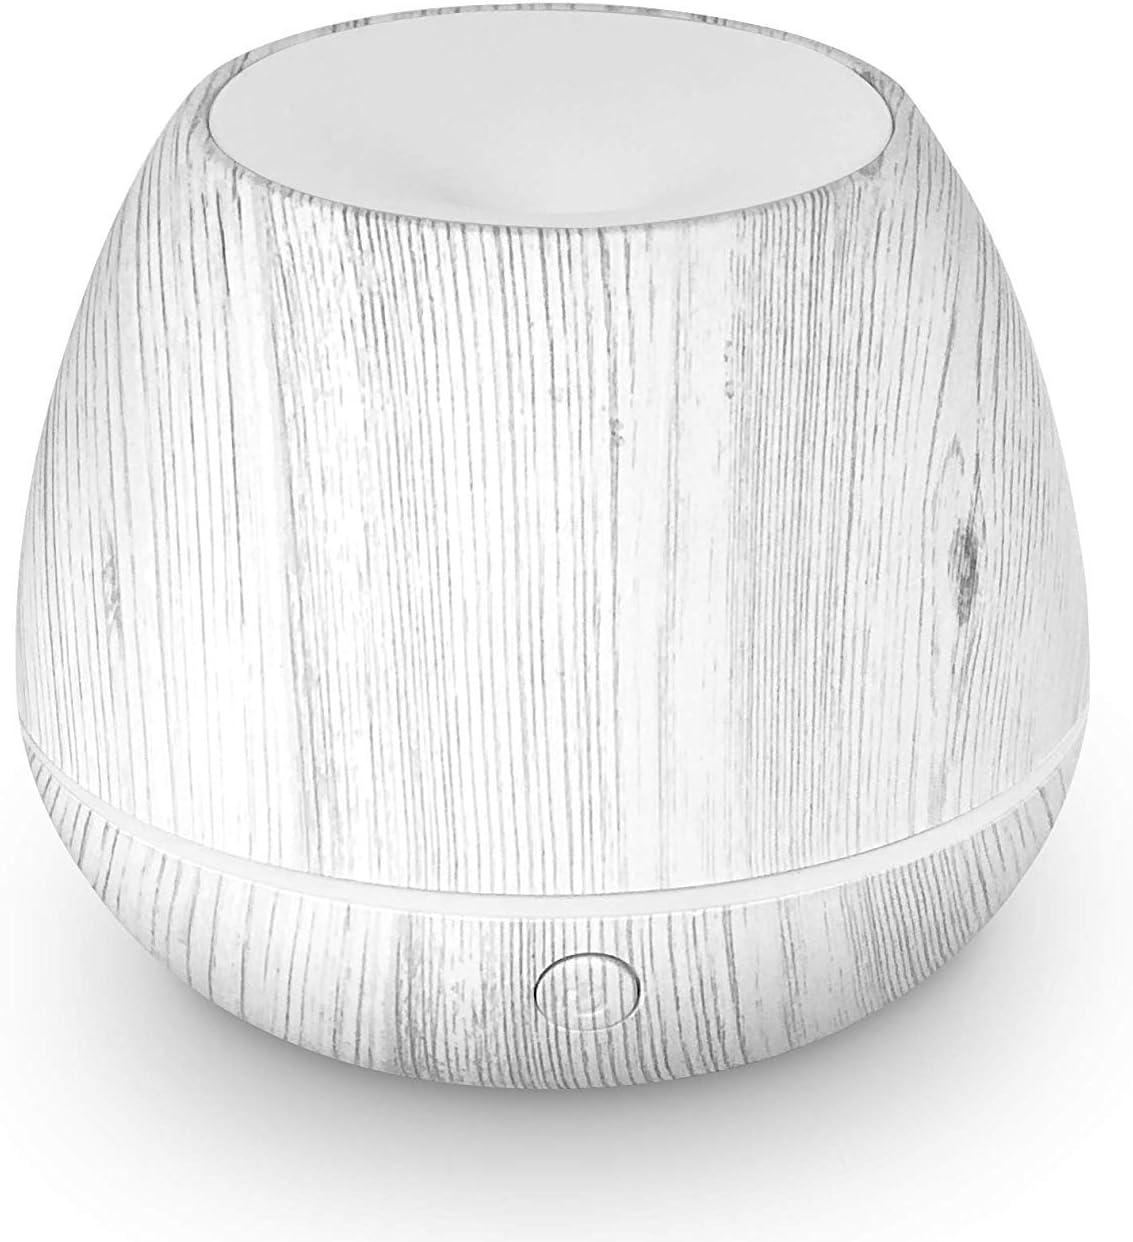 LEMON + Co. Mini Cool Mist Air Humidifier Ultrasonic Aroma Essential Oils Diffuser with Multiple Lighting Options, White Wood Grain, 150 ml